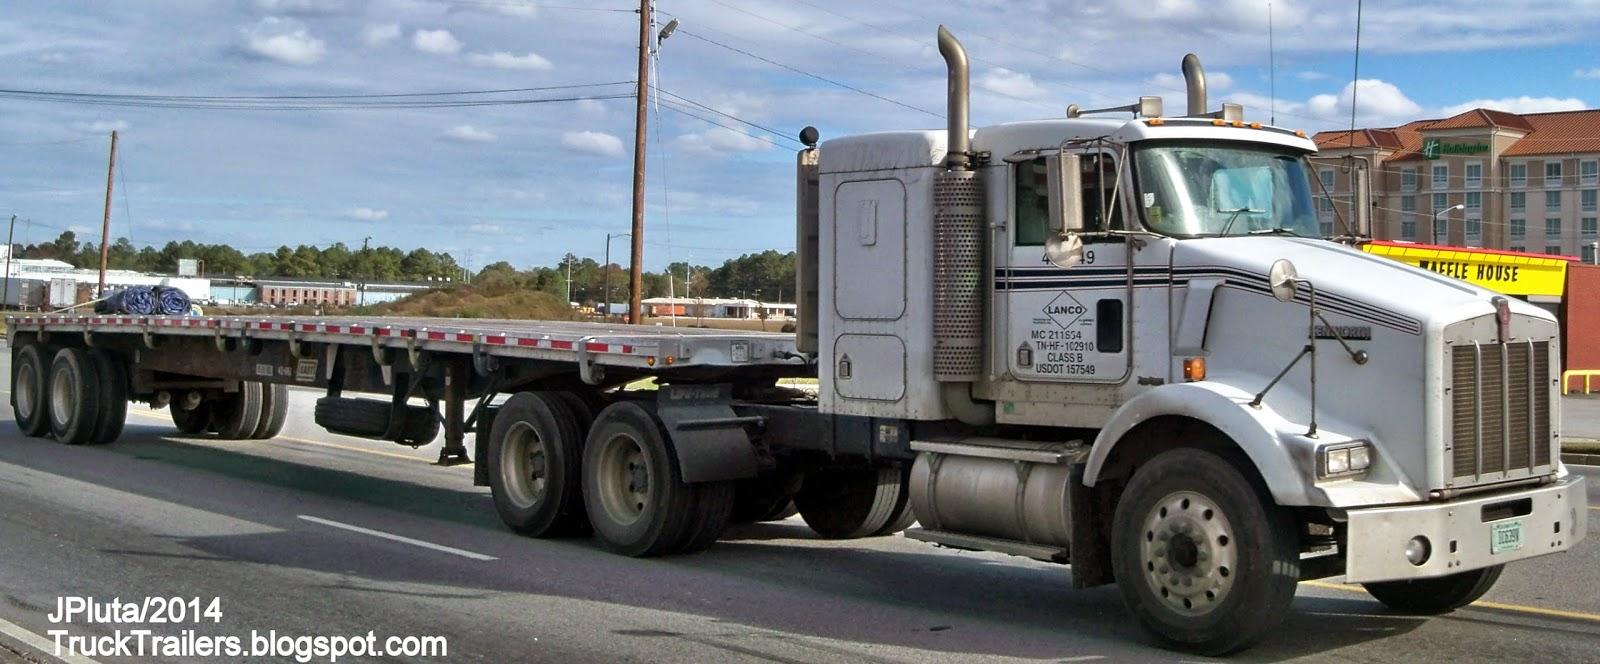 TRUCK TRAILER Transport Express Freight Logistic Diesel Mack